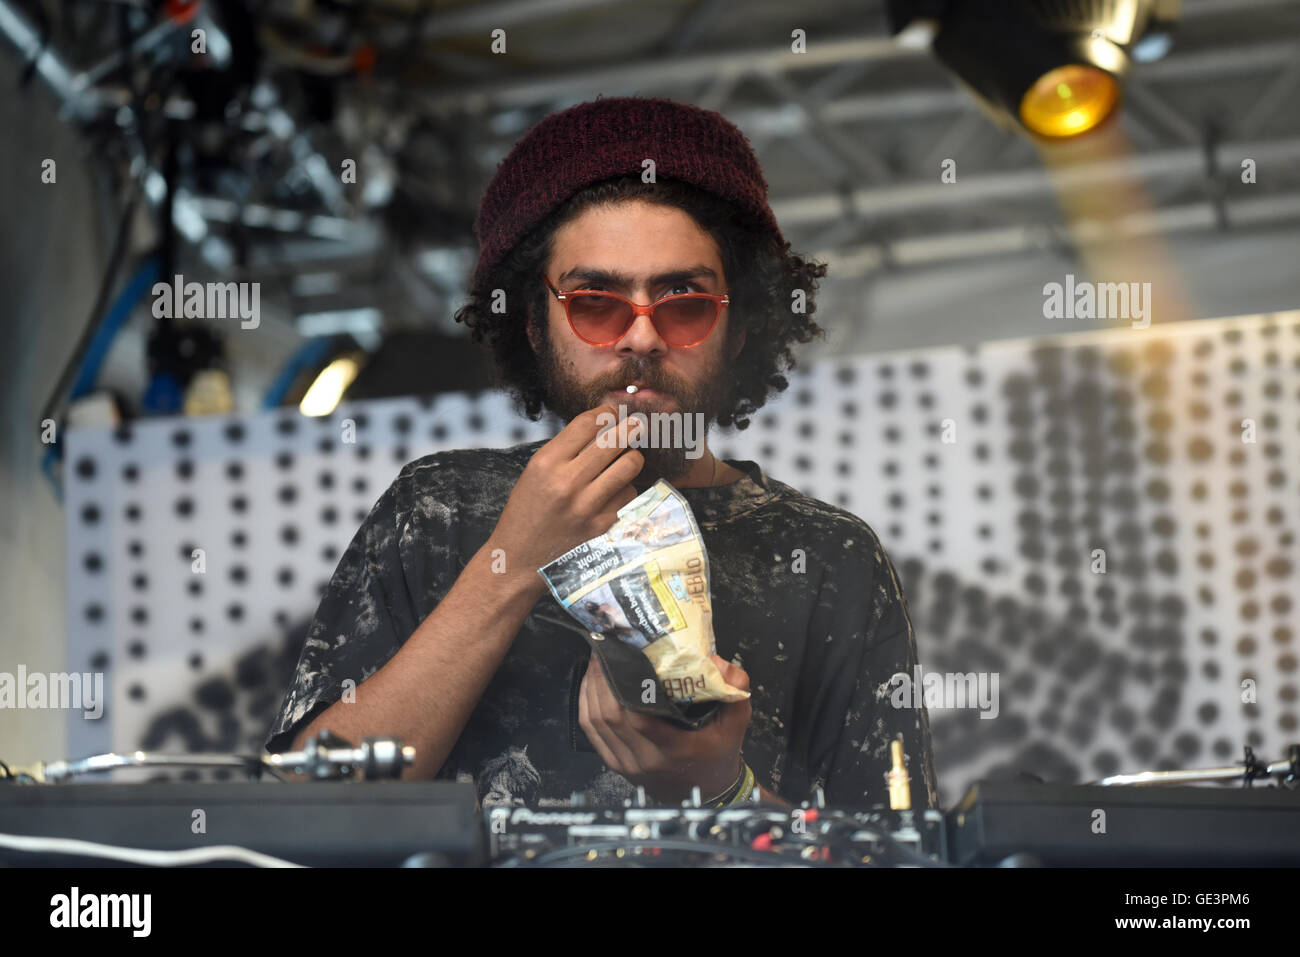 Duesseldorf, Germany. 22nd July, 2016. Noah Becker, son of tennis legend Boris Becker, DJ'ing at the fashion - Stock Image